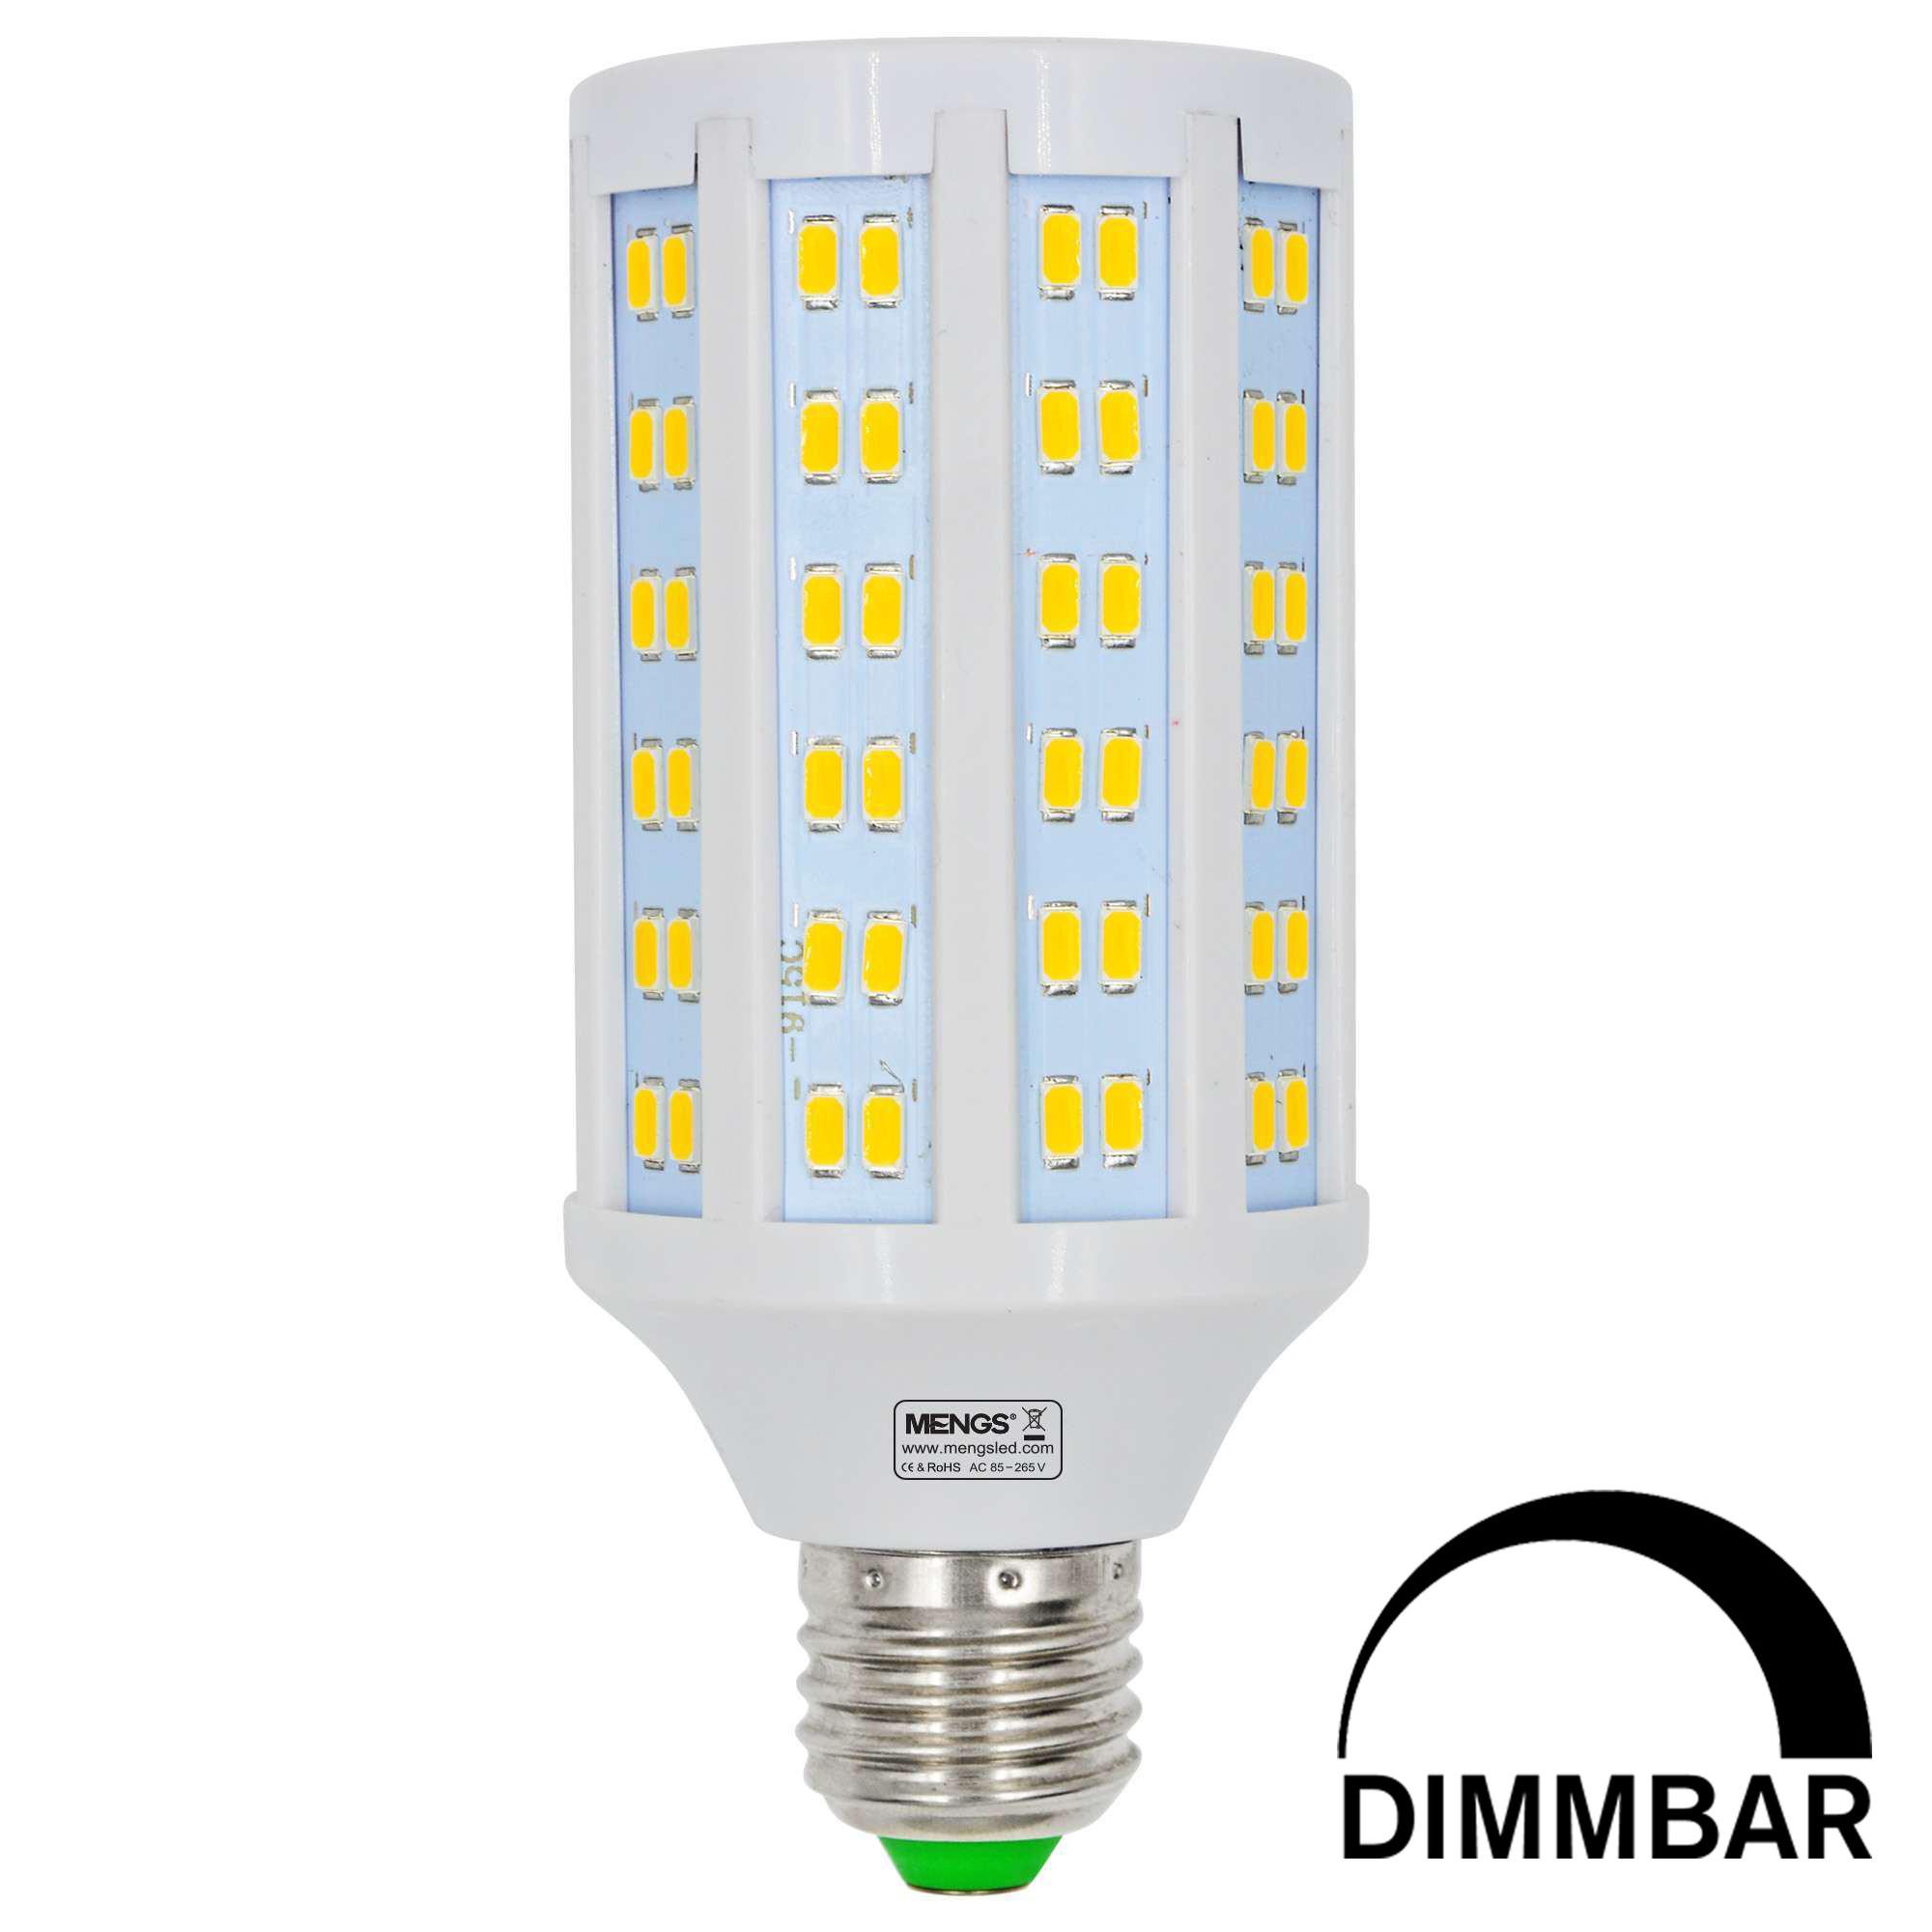 MENGS® E27 20W LED Dimmable Corn Light 144x 5730 SMD LED Bulb Lamp AC 85-265V in Warm White Energy-Saving Light